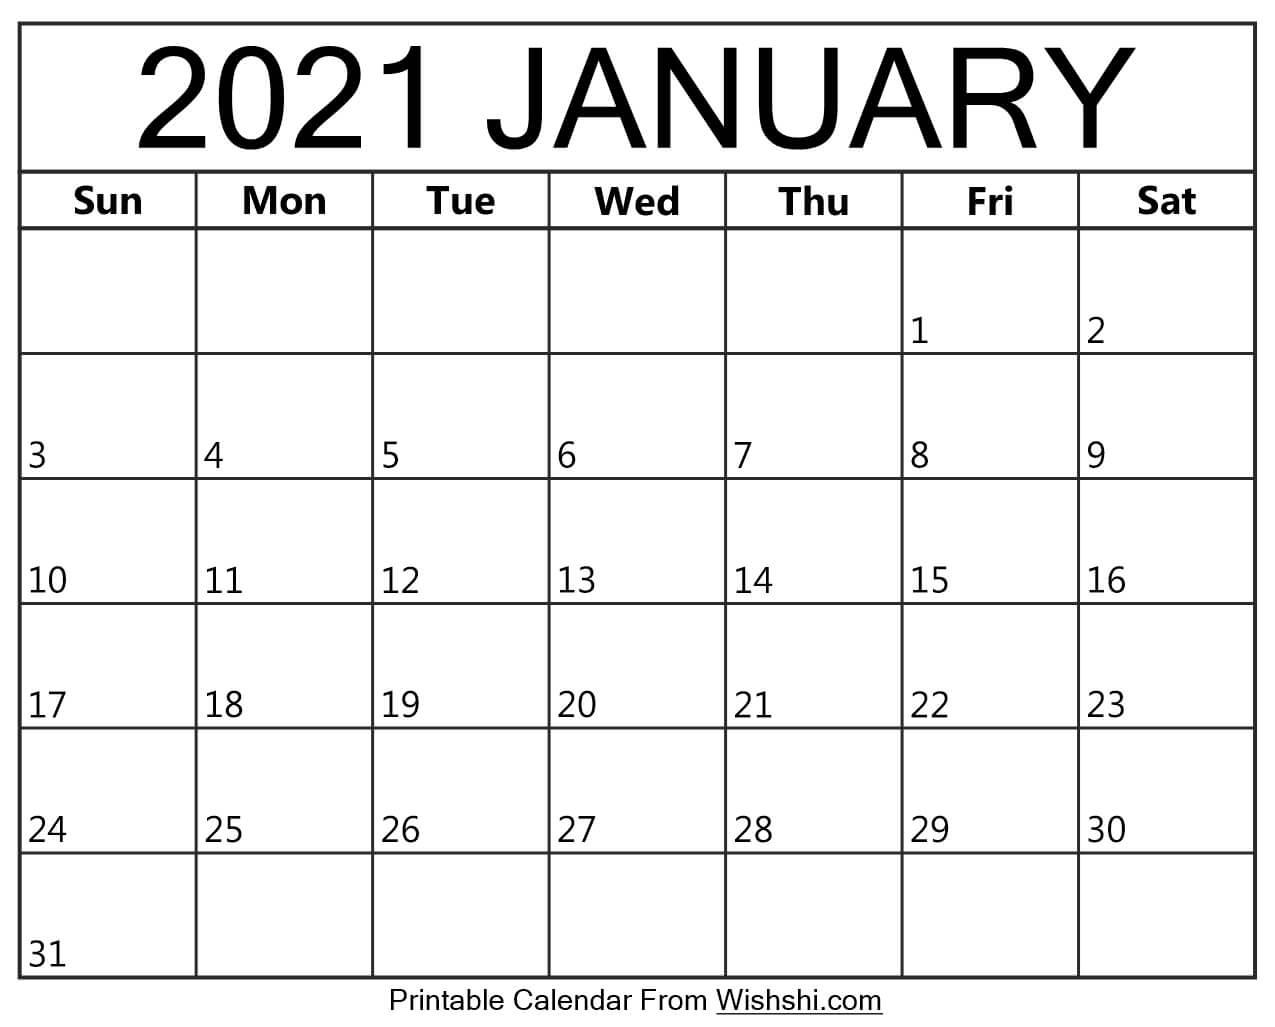 January 2021 Calendar Printable Free Monthly / January